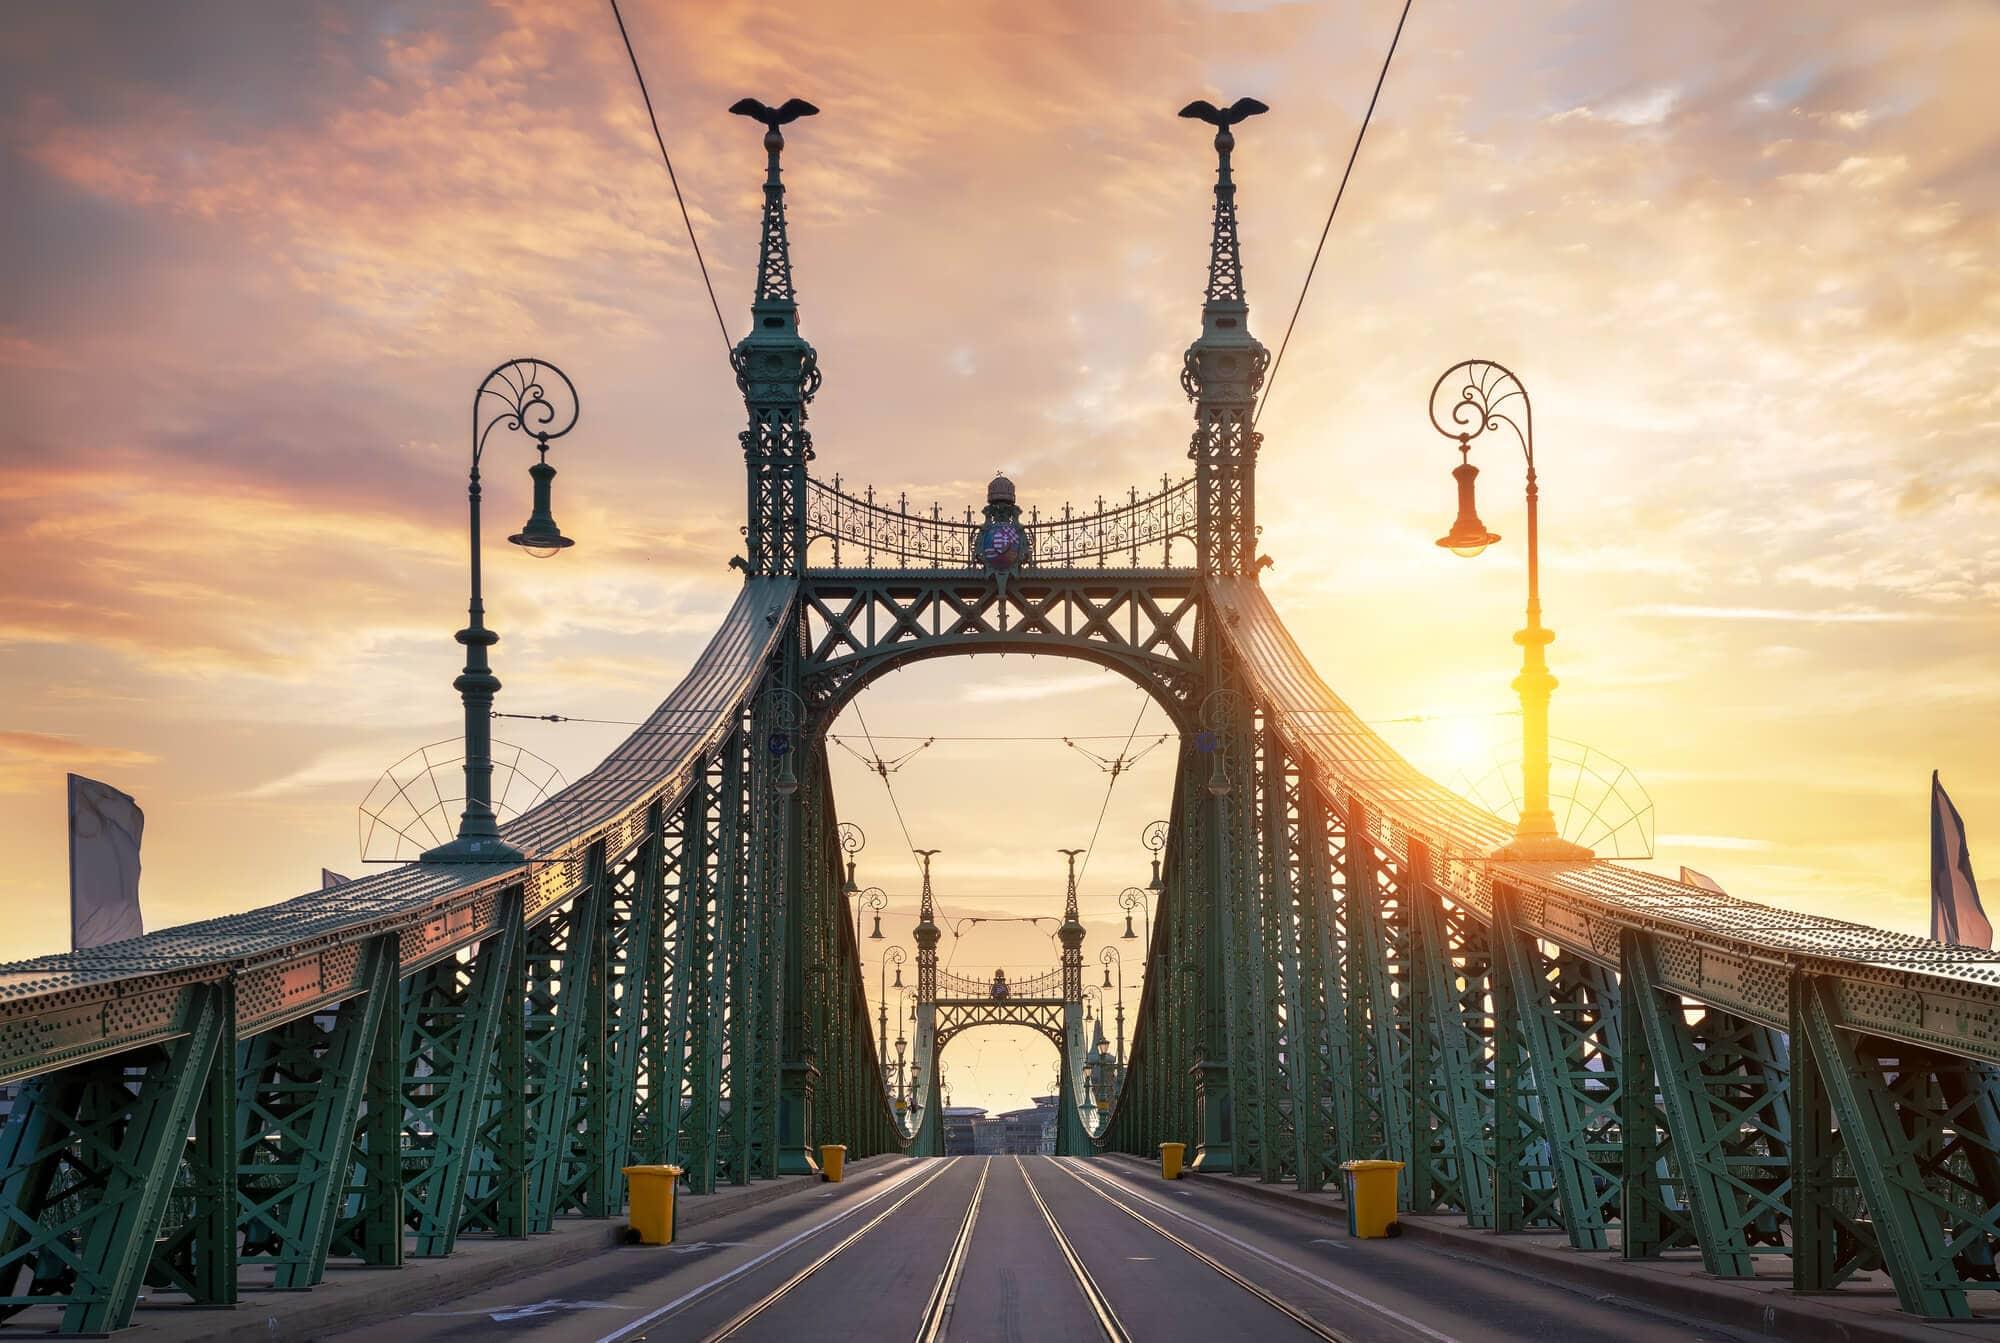 Budapest Instagram photo guide - Liberty Bridge at sunset